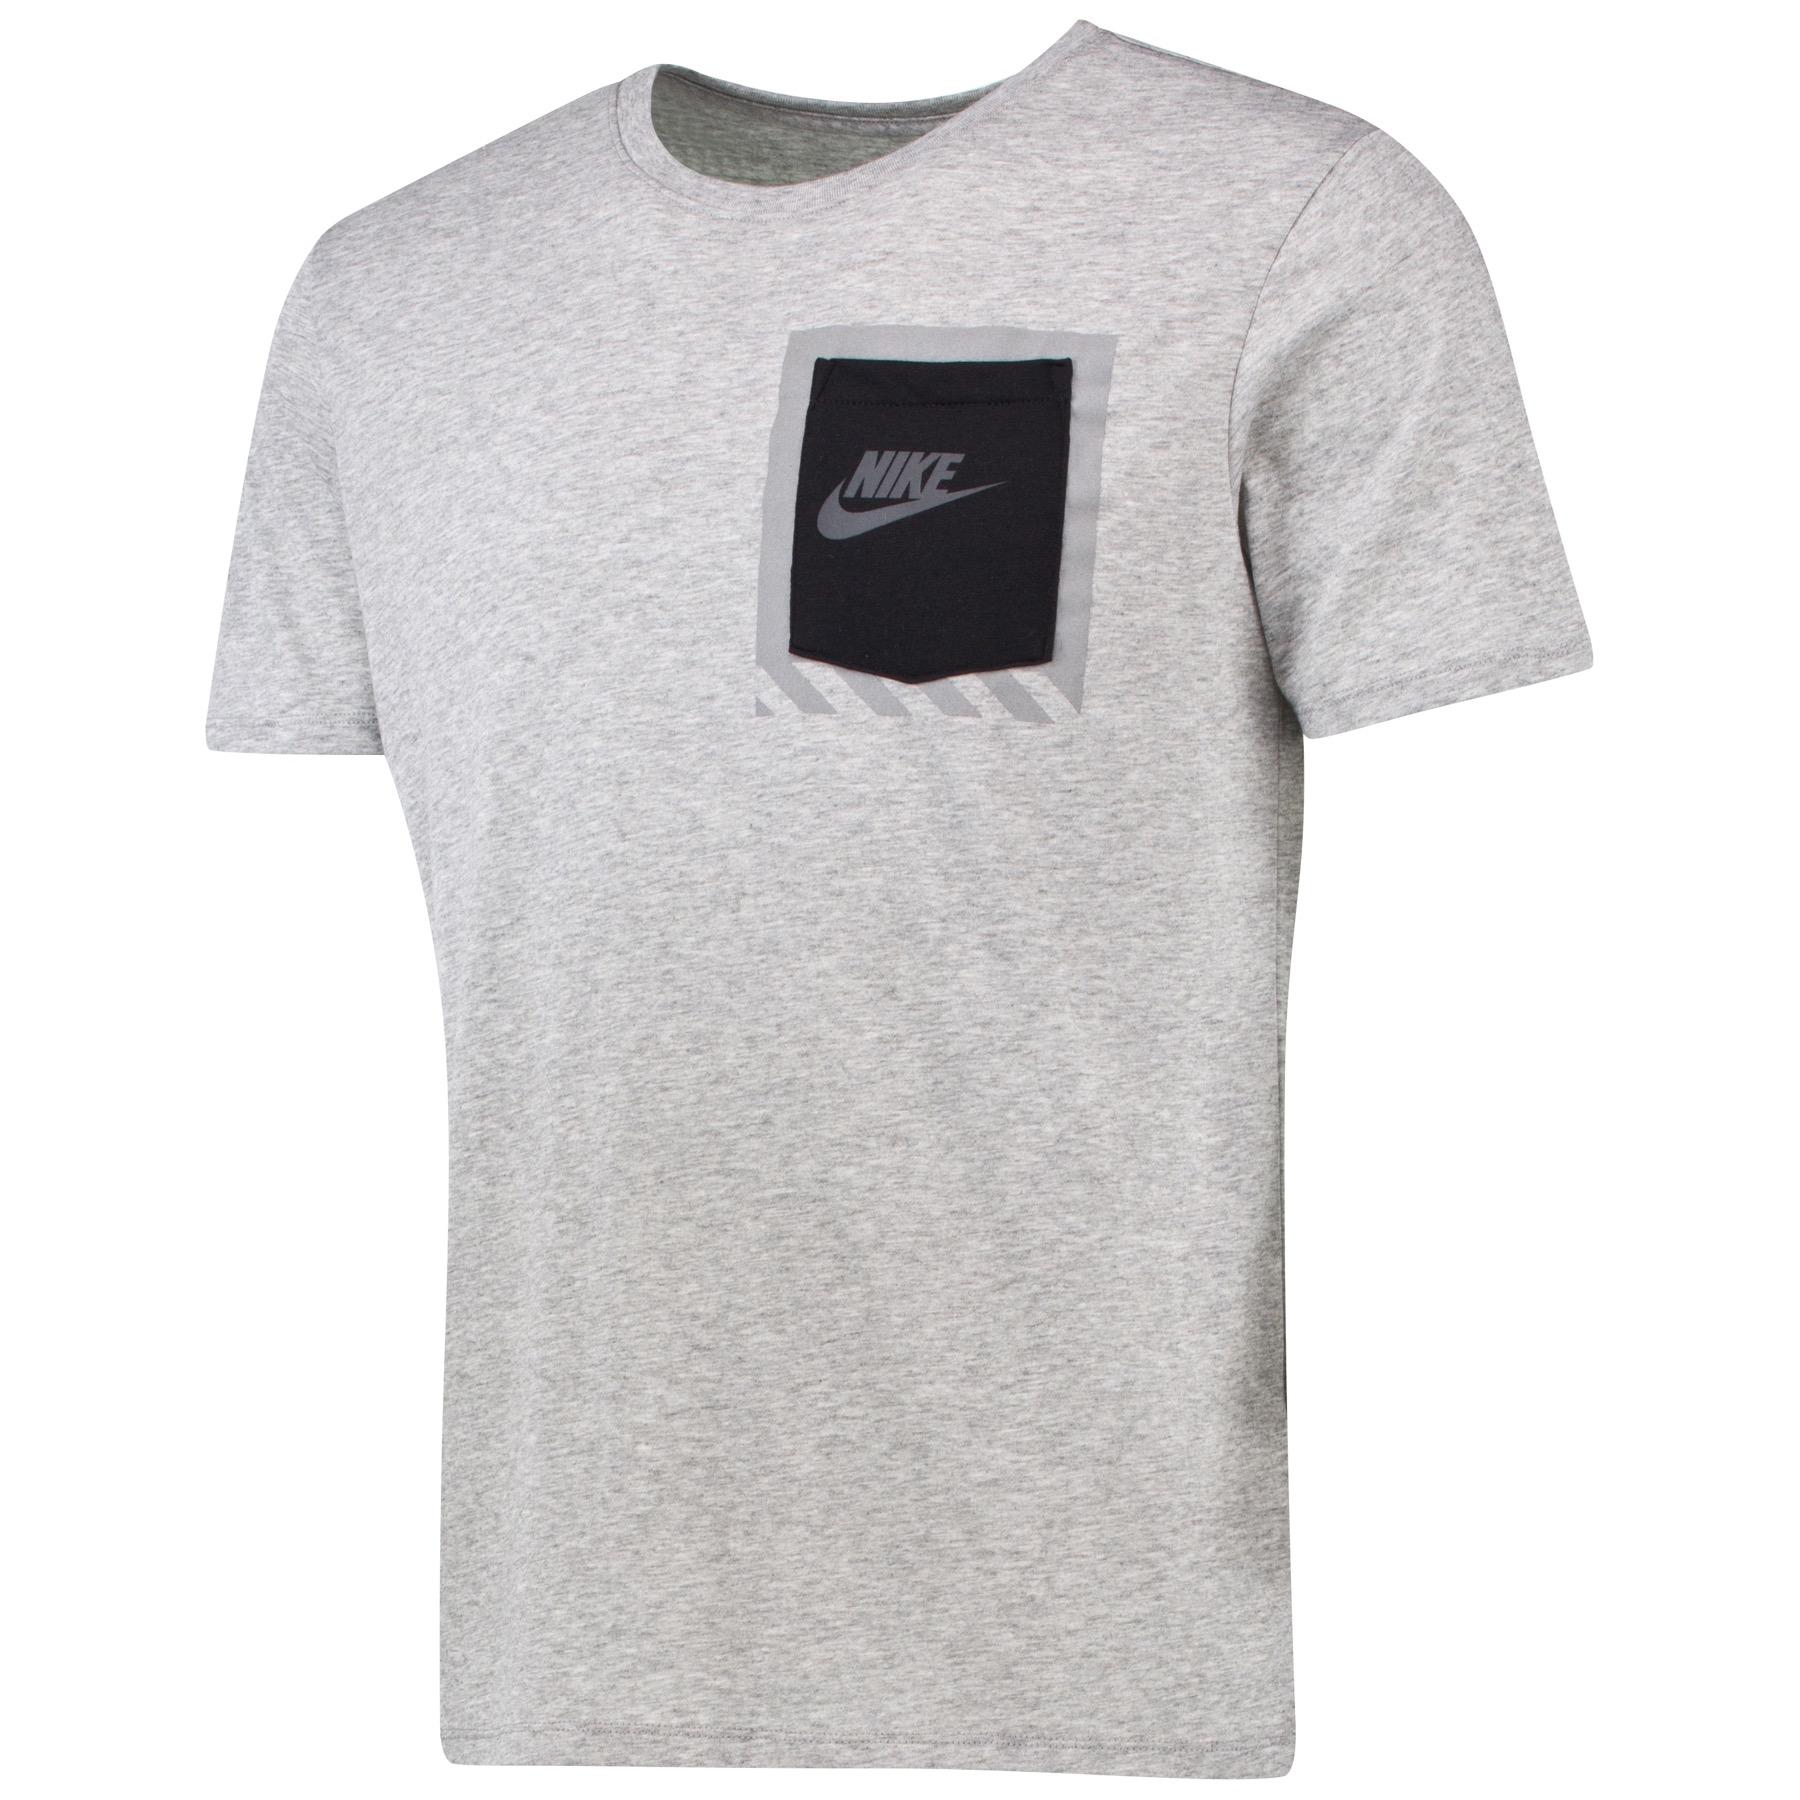 Image of Nike Bonded Box Pocket T-Shirt Dk Grey, Grey